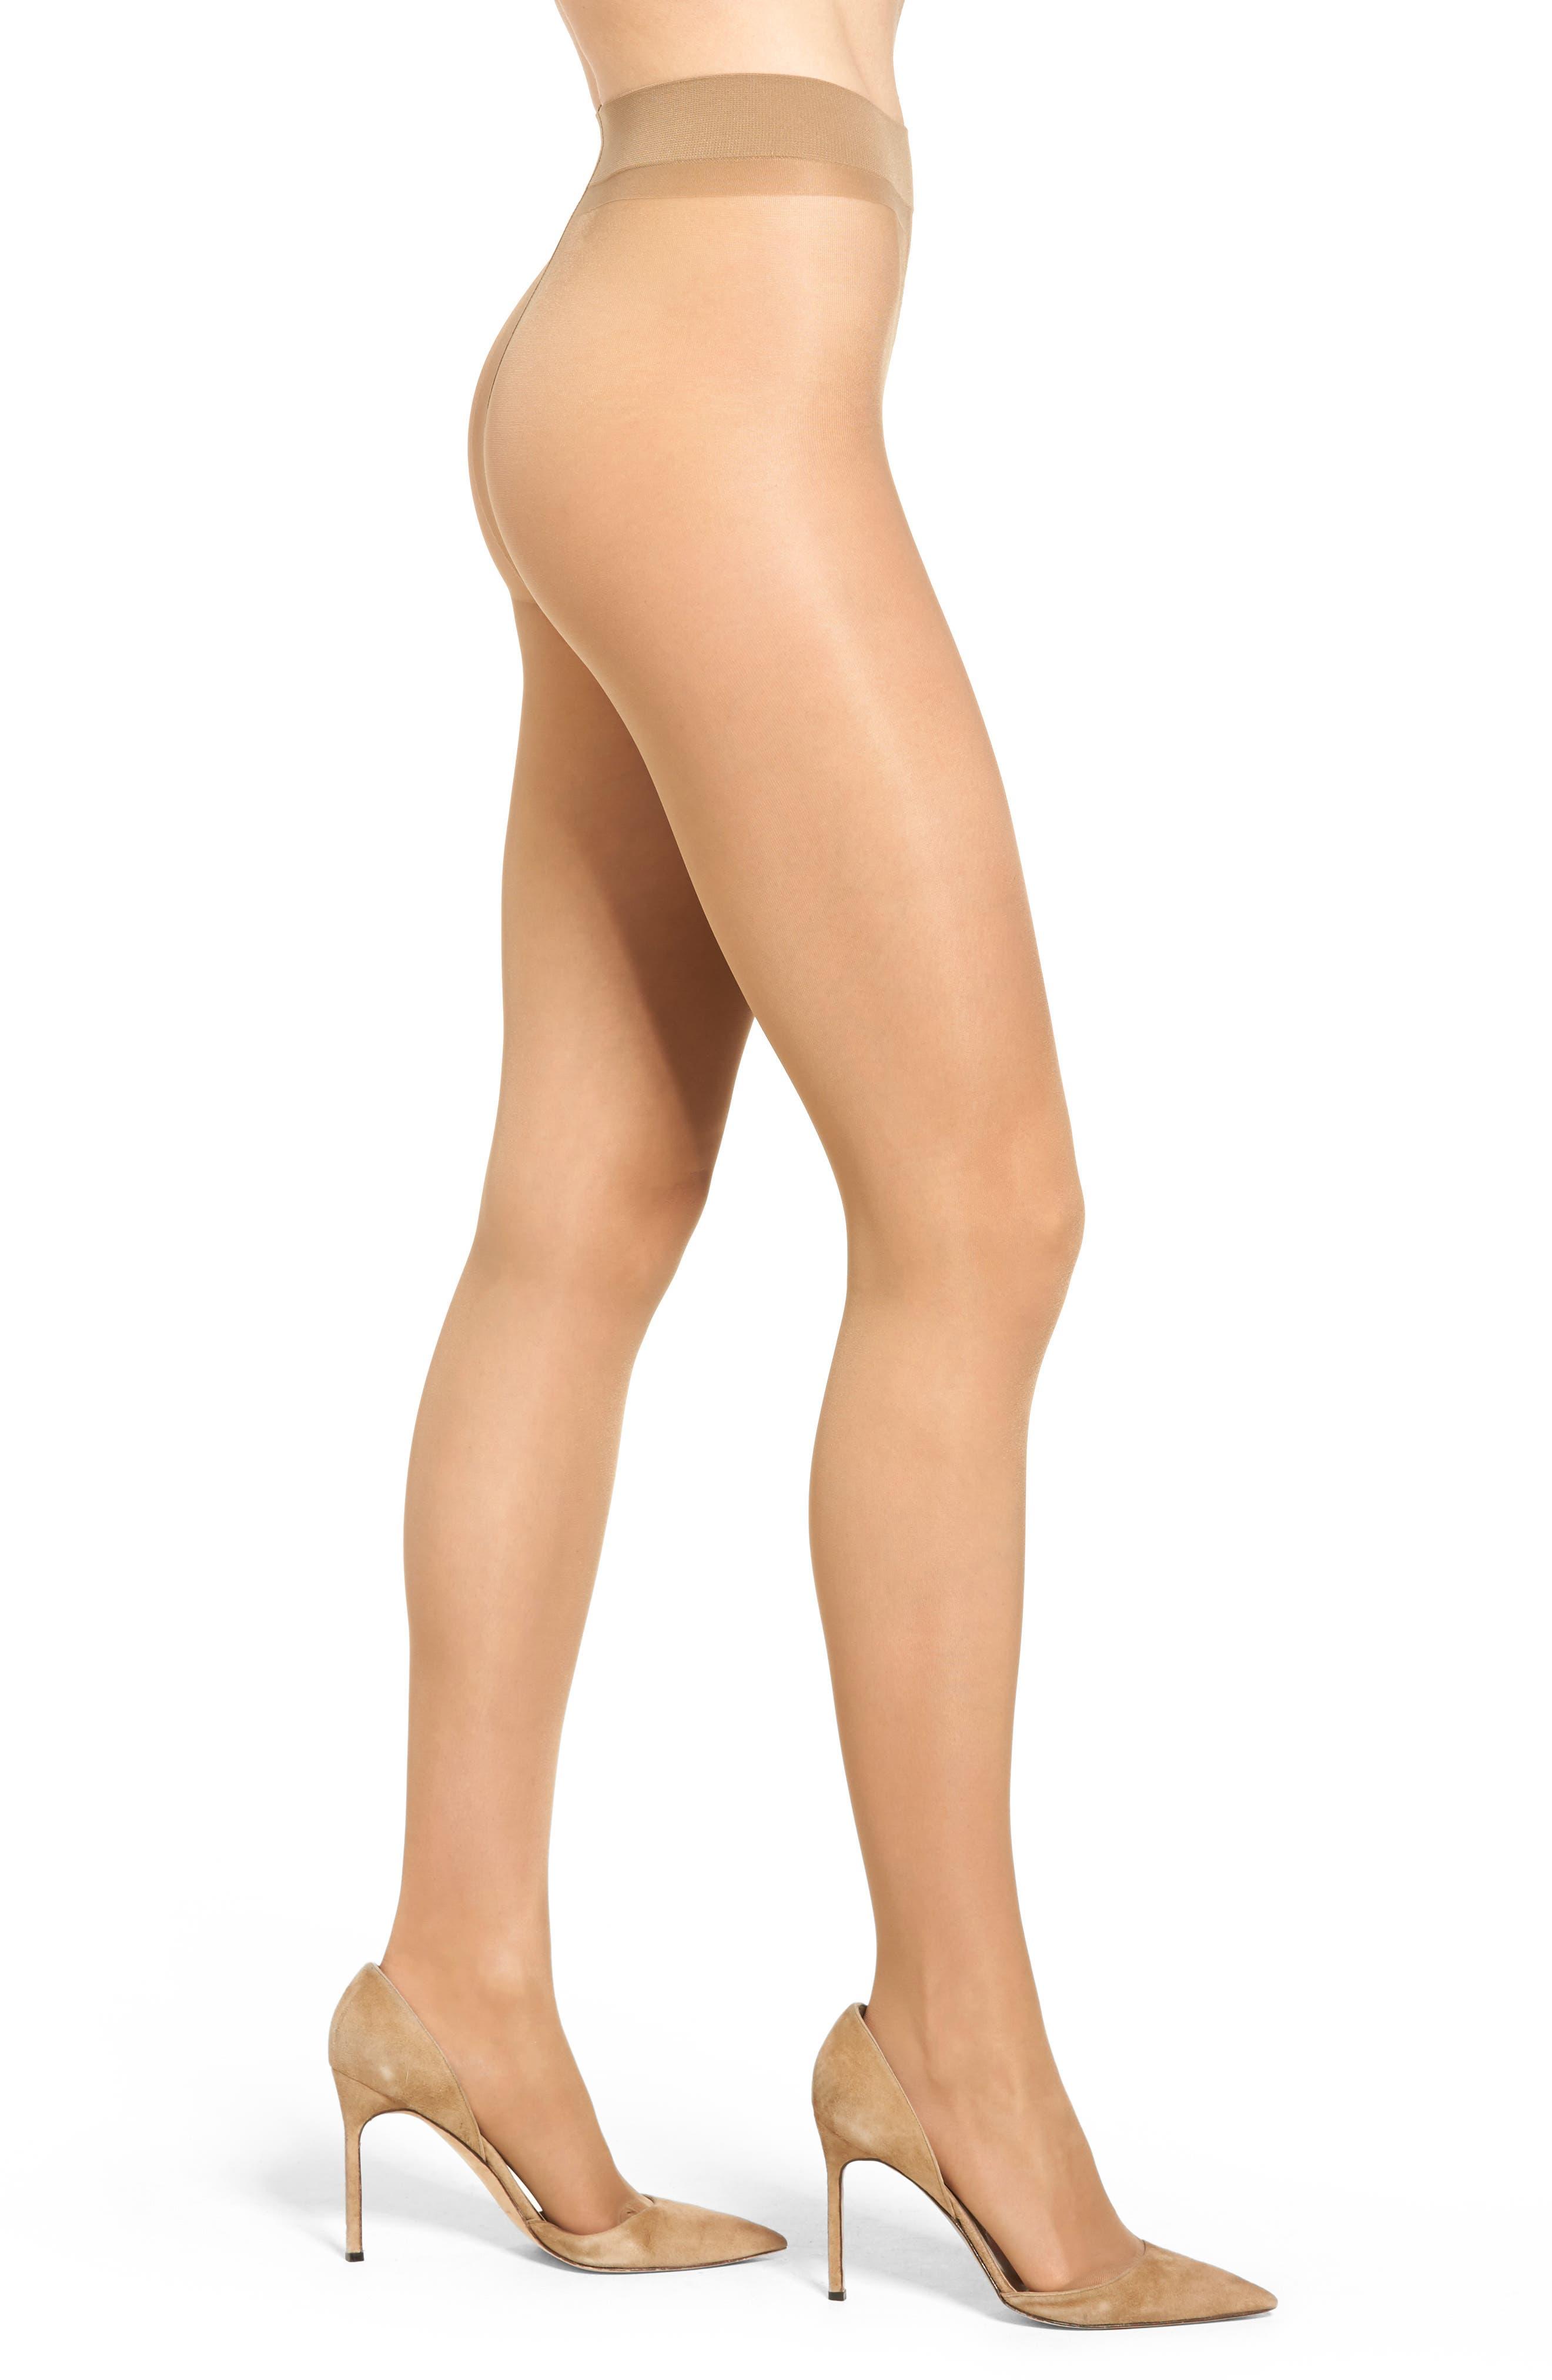 Oroblu Repos 70 Control Top Pantyhose